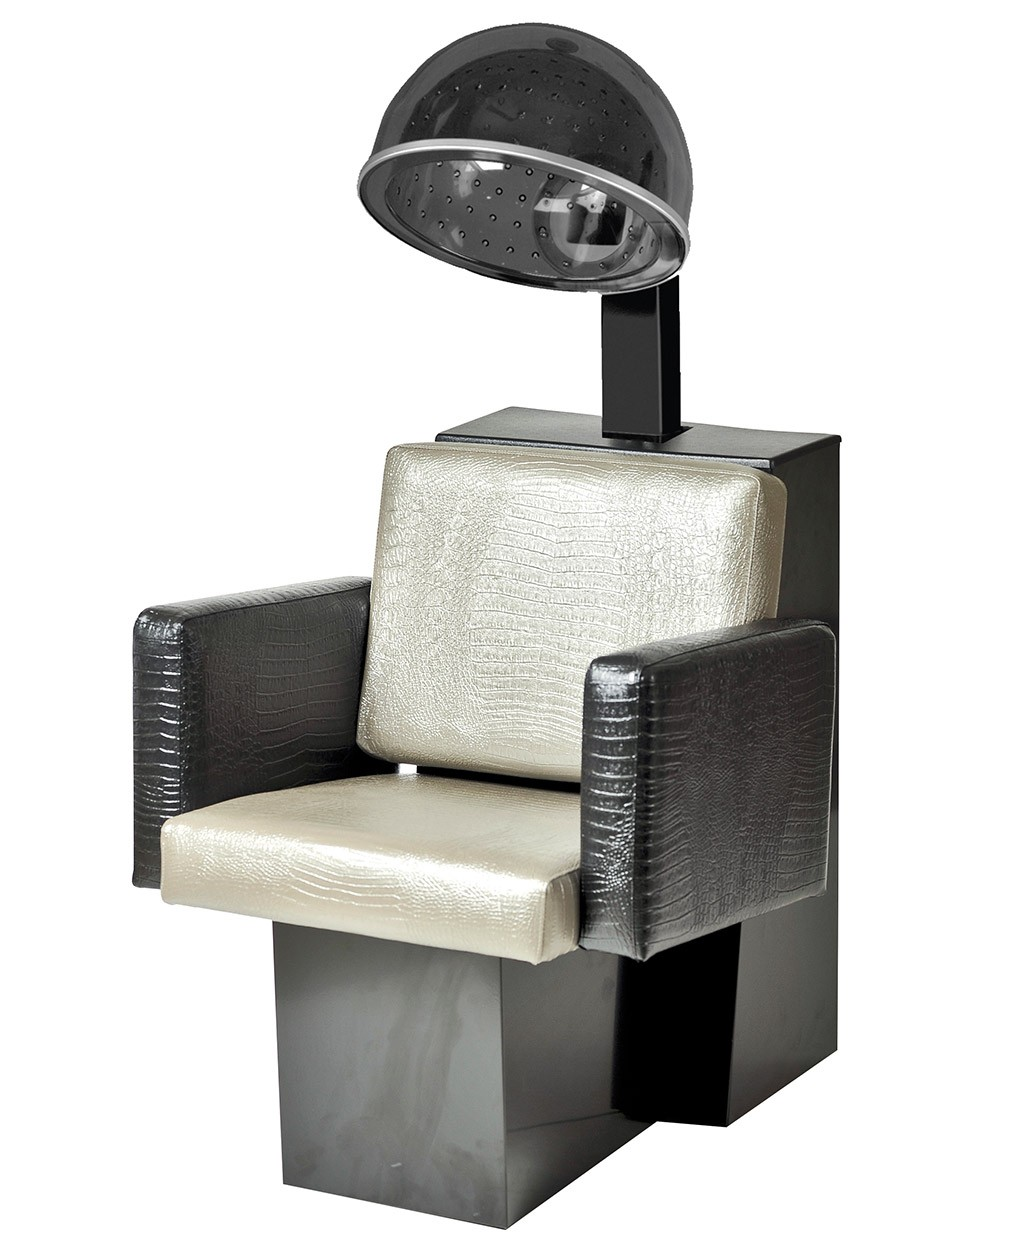 dryer chairs salon green adirondack pibbs 3469 cosmo chair